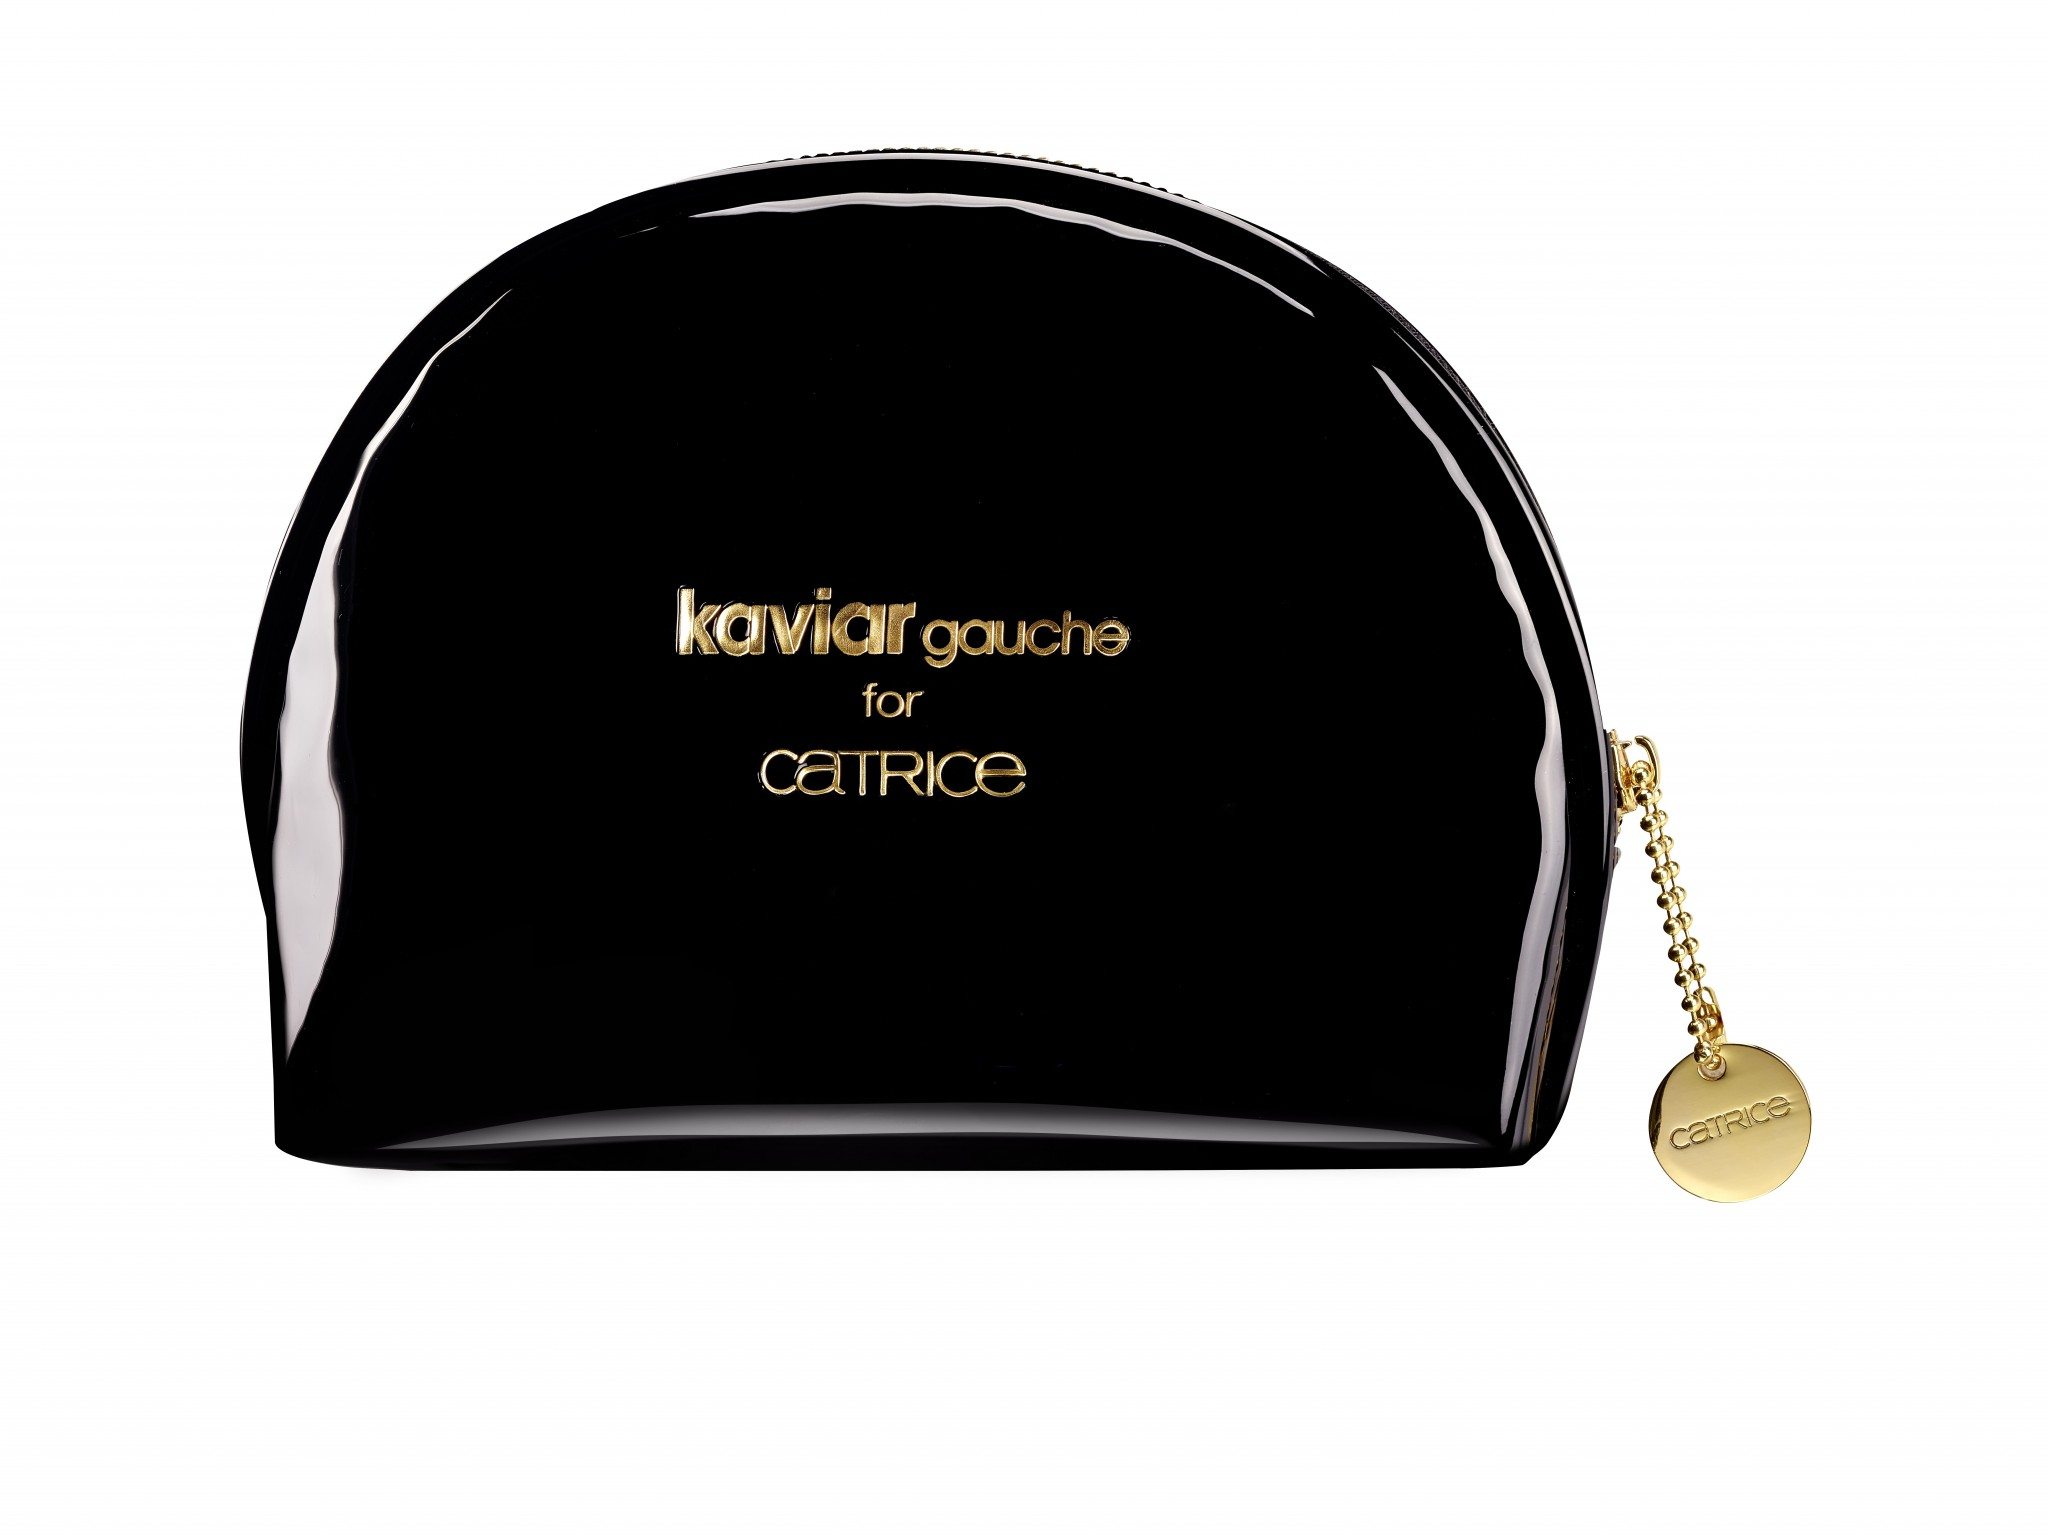 catr_kaviar-gauche_make-up_bag_front